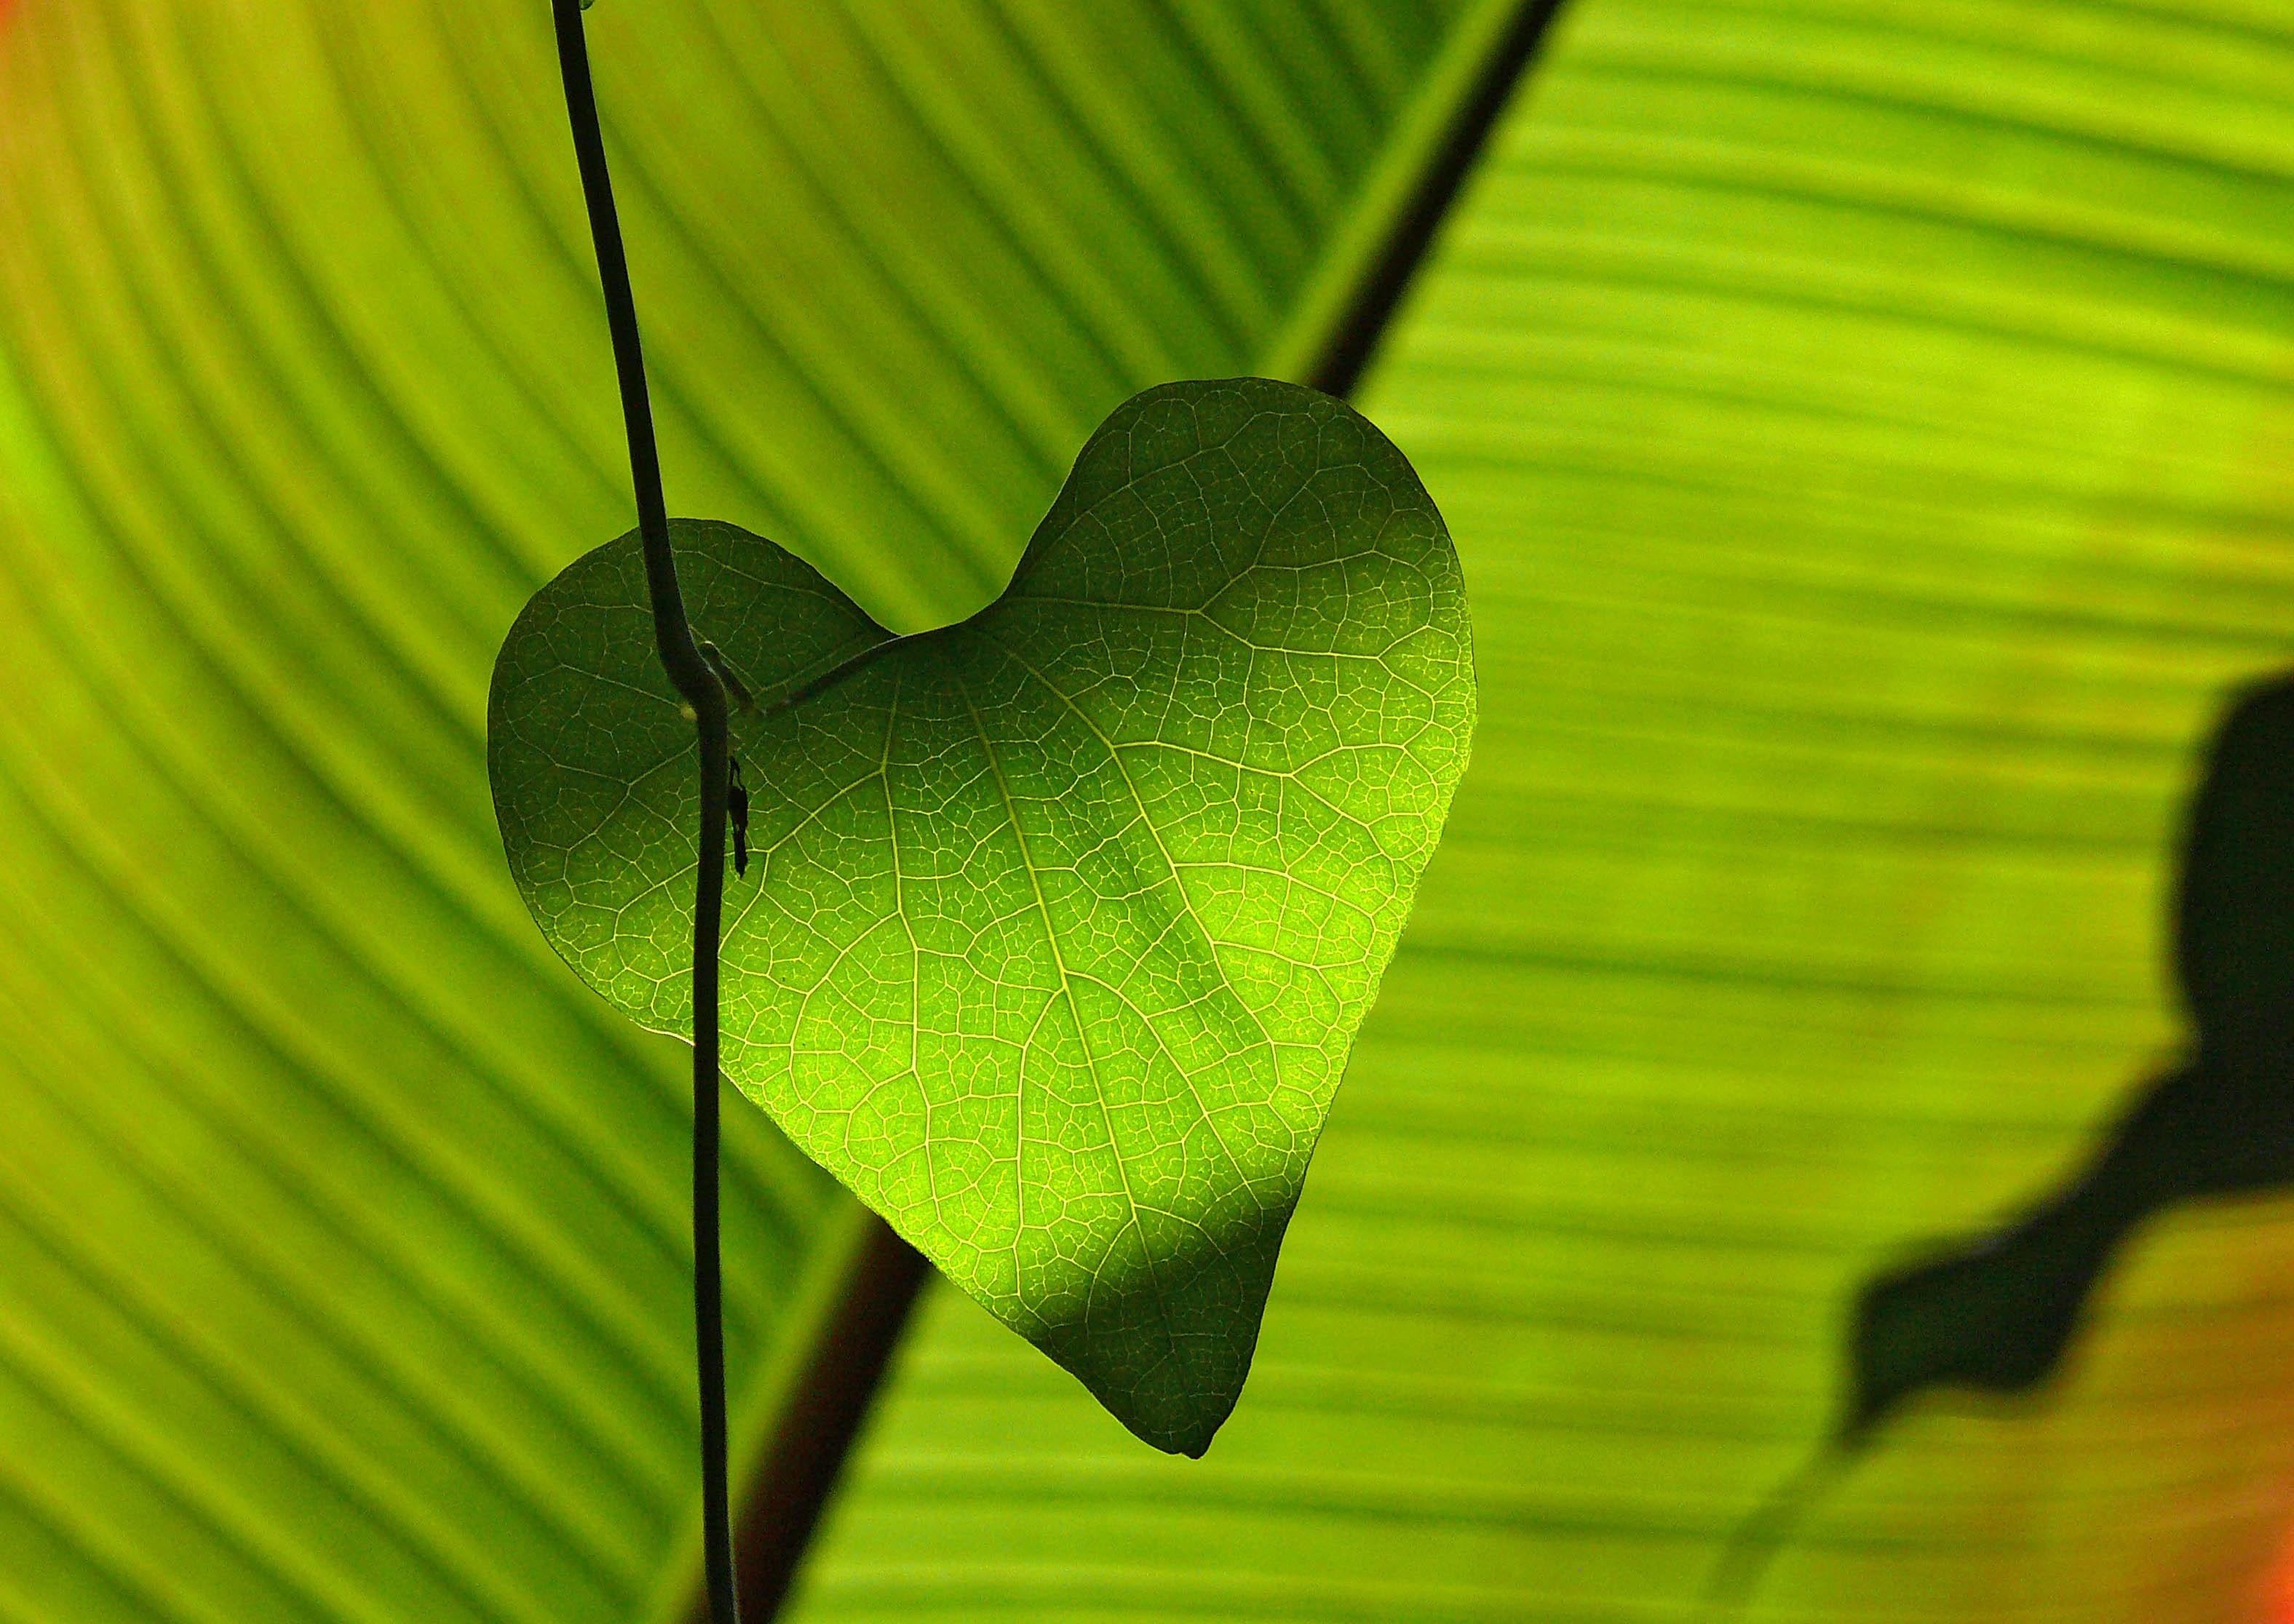 Green heart shape leaf photo